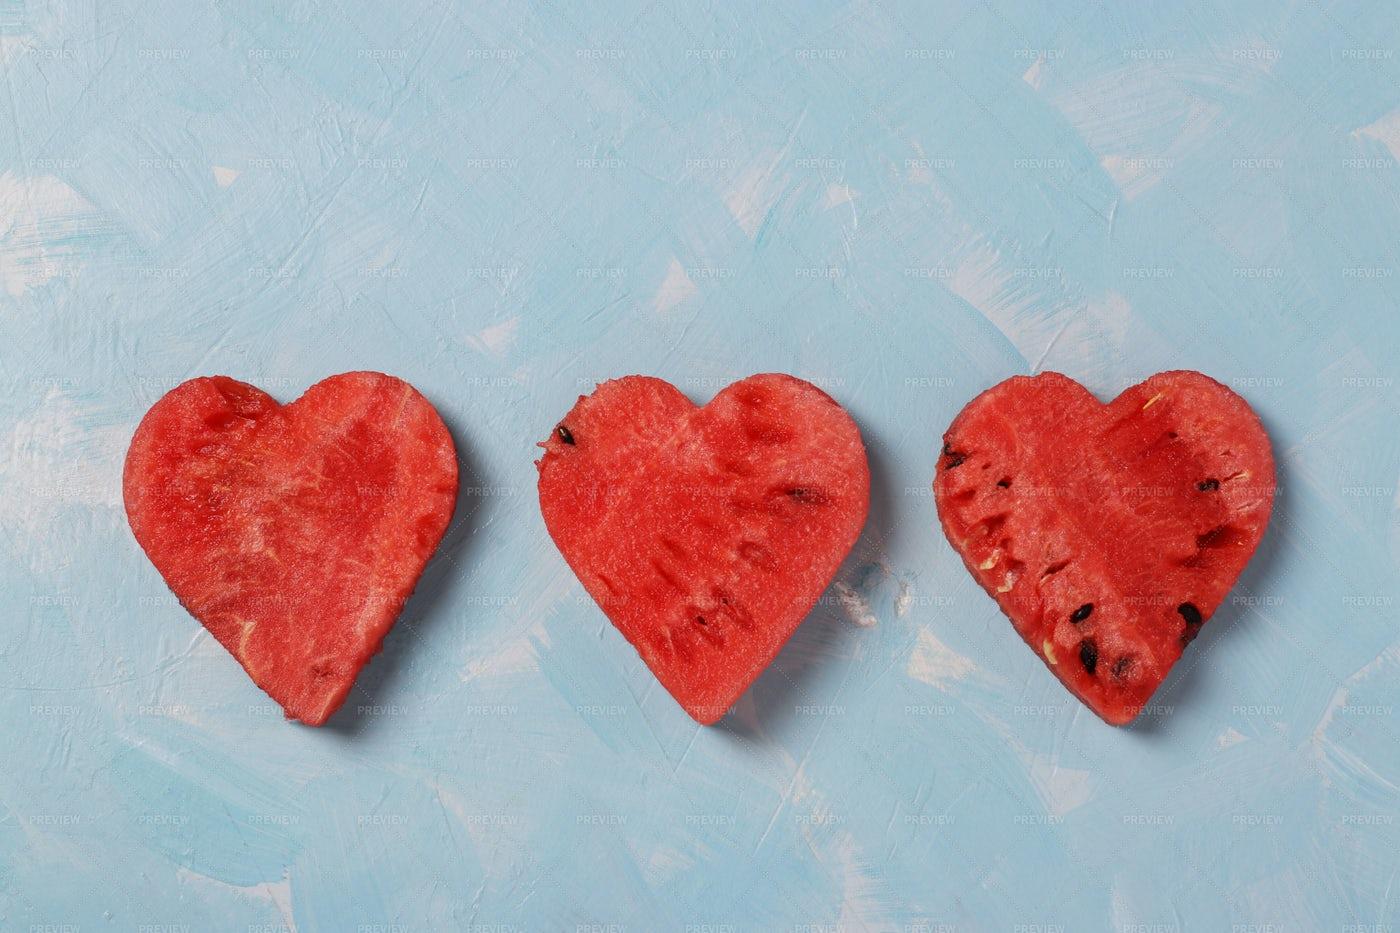 Watermelon Slices As Hearts: Stock Photos